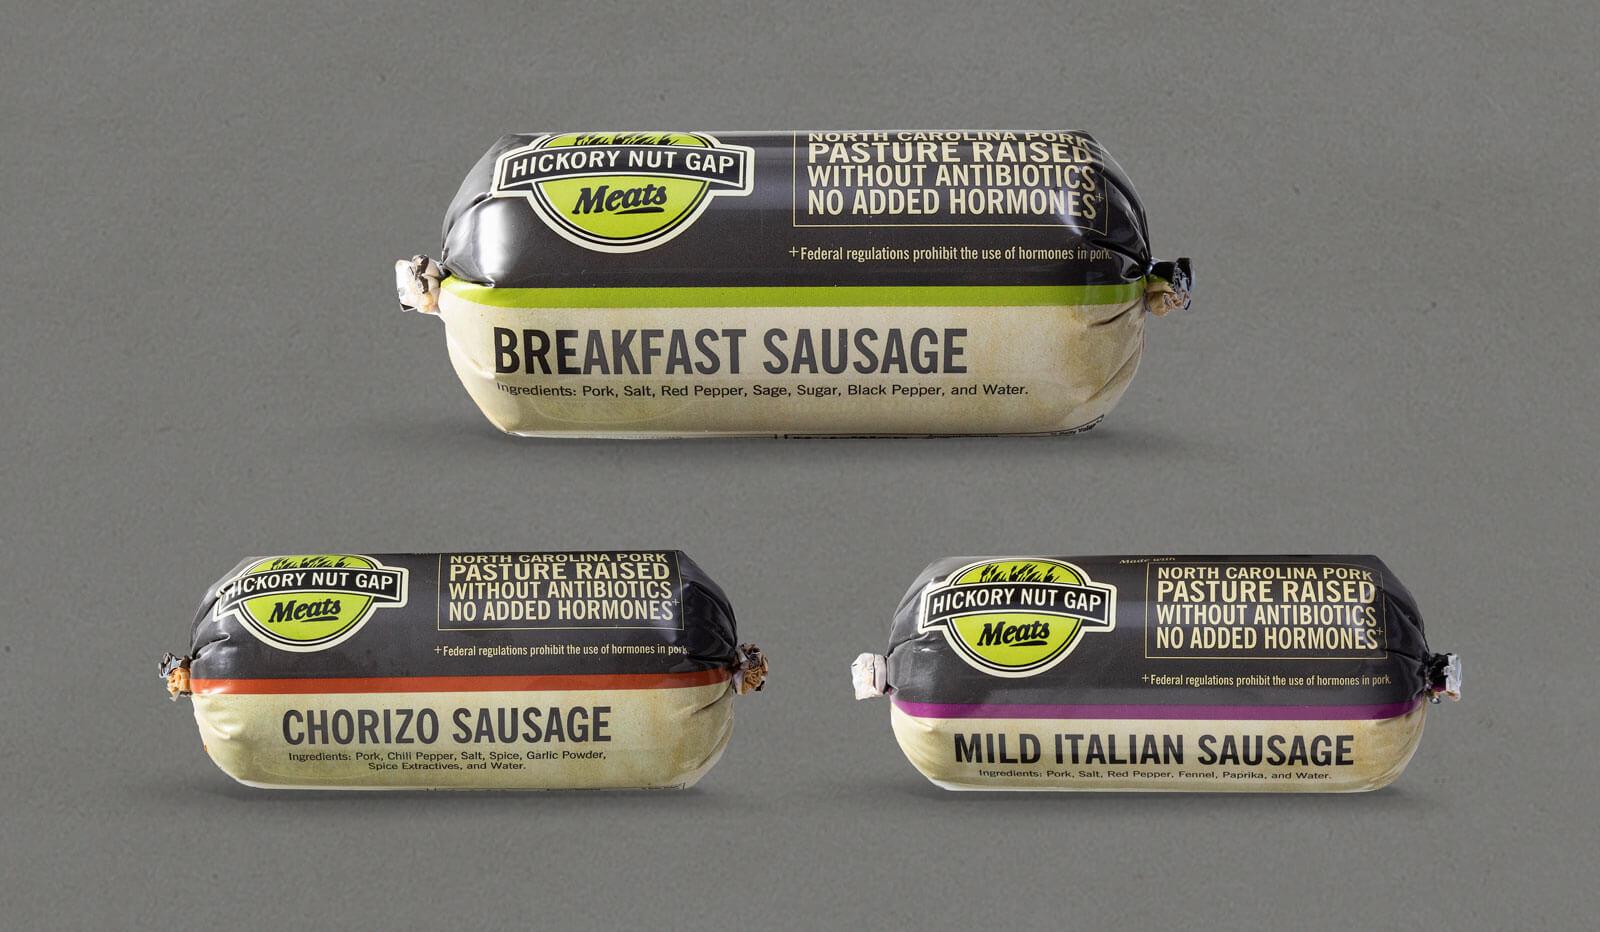 Hickory Nut Gap Meats packaging of Breakfast Sausage plastic vacuum sealed wrap.